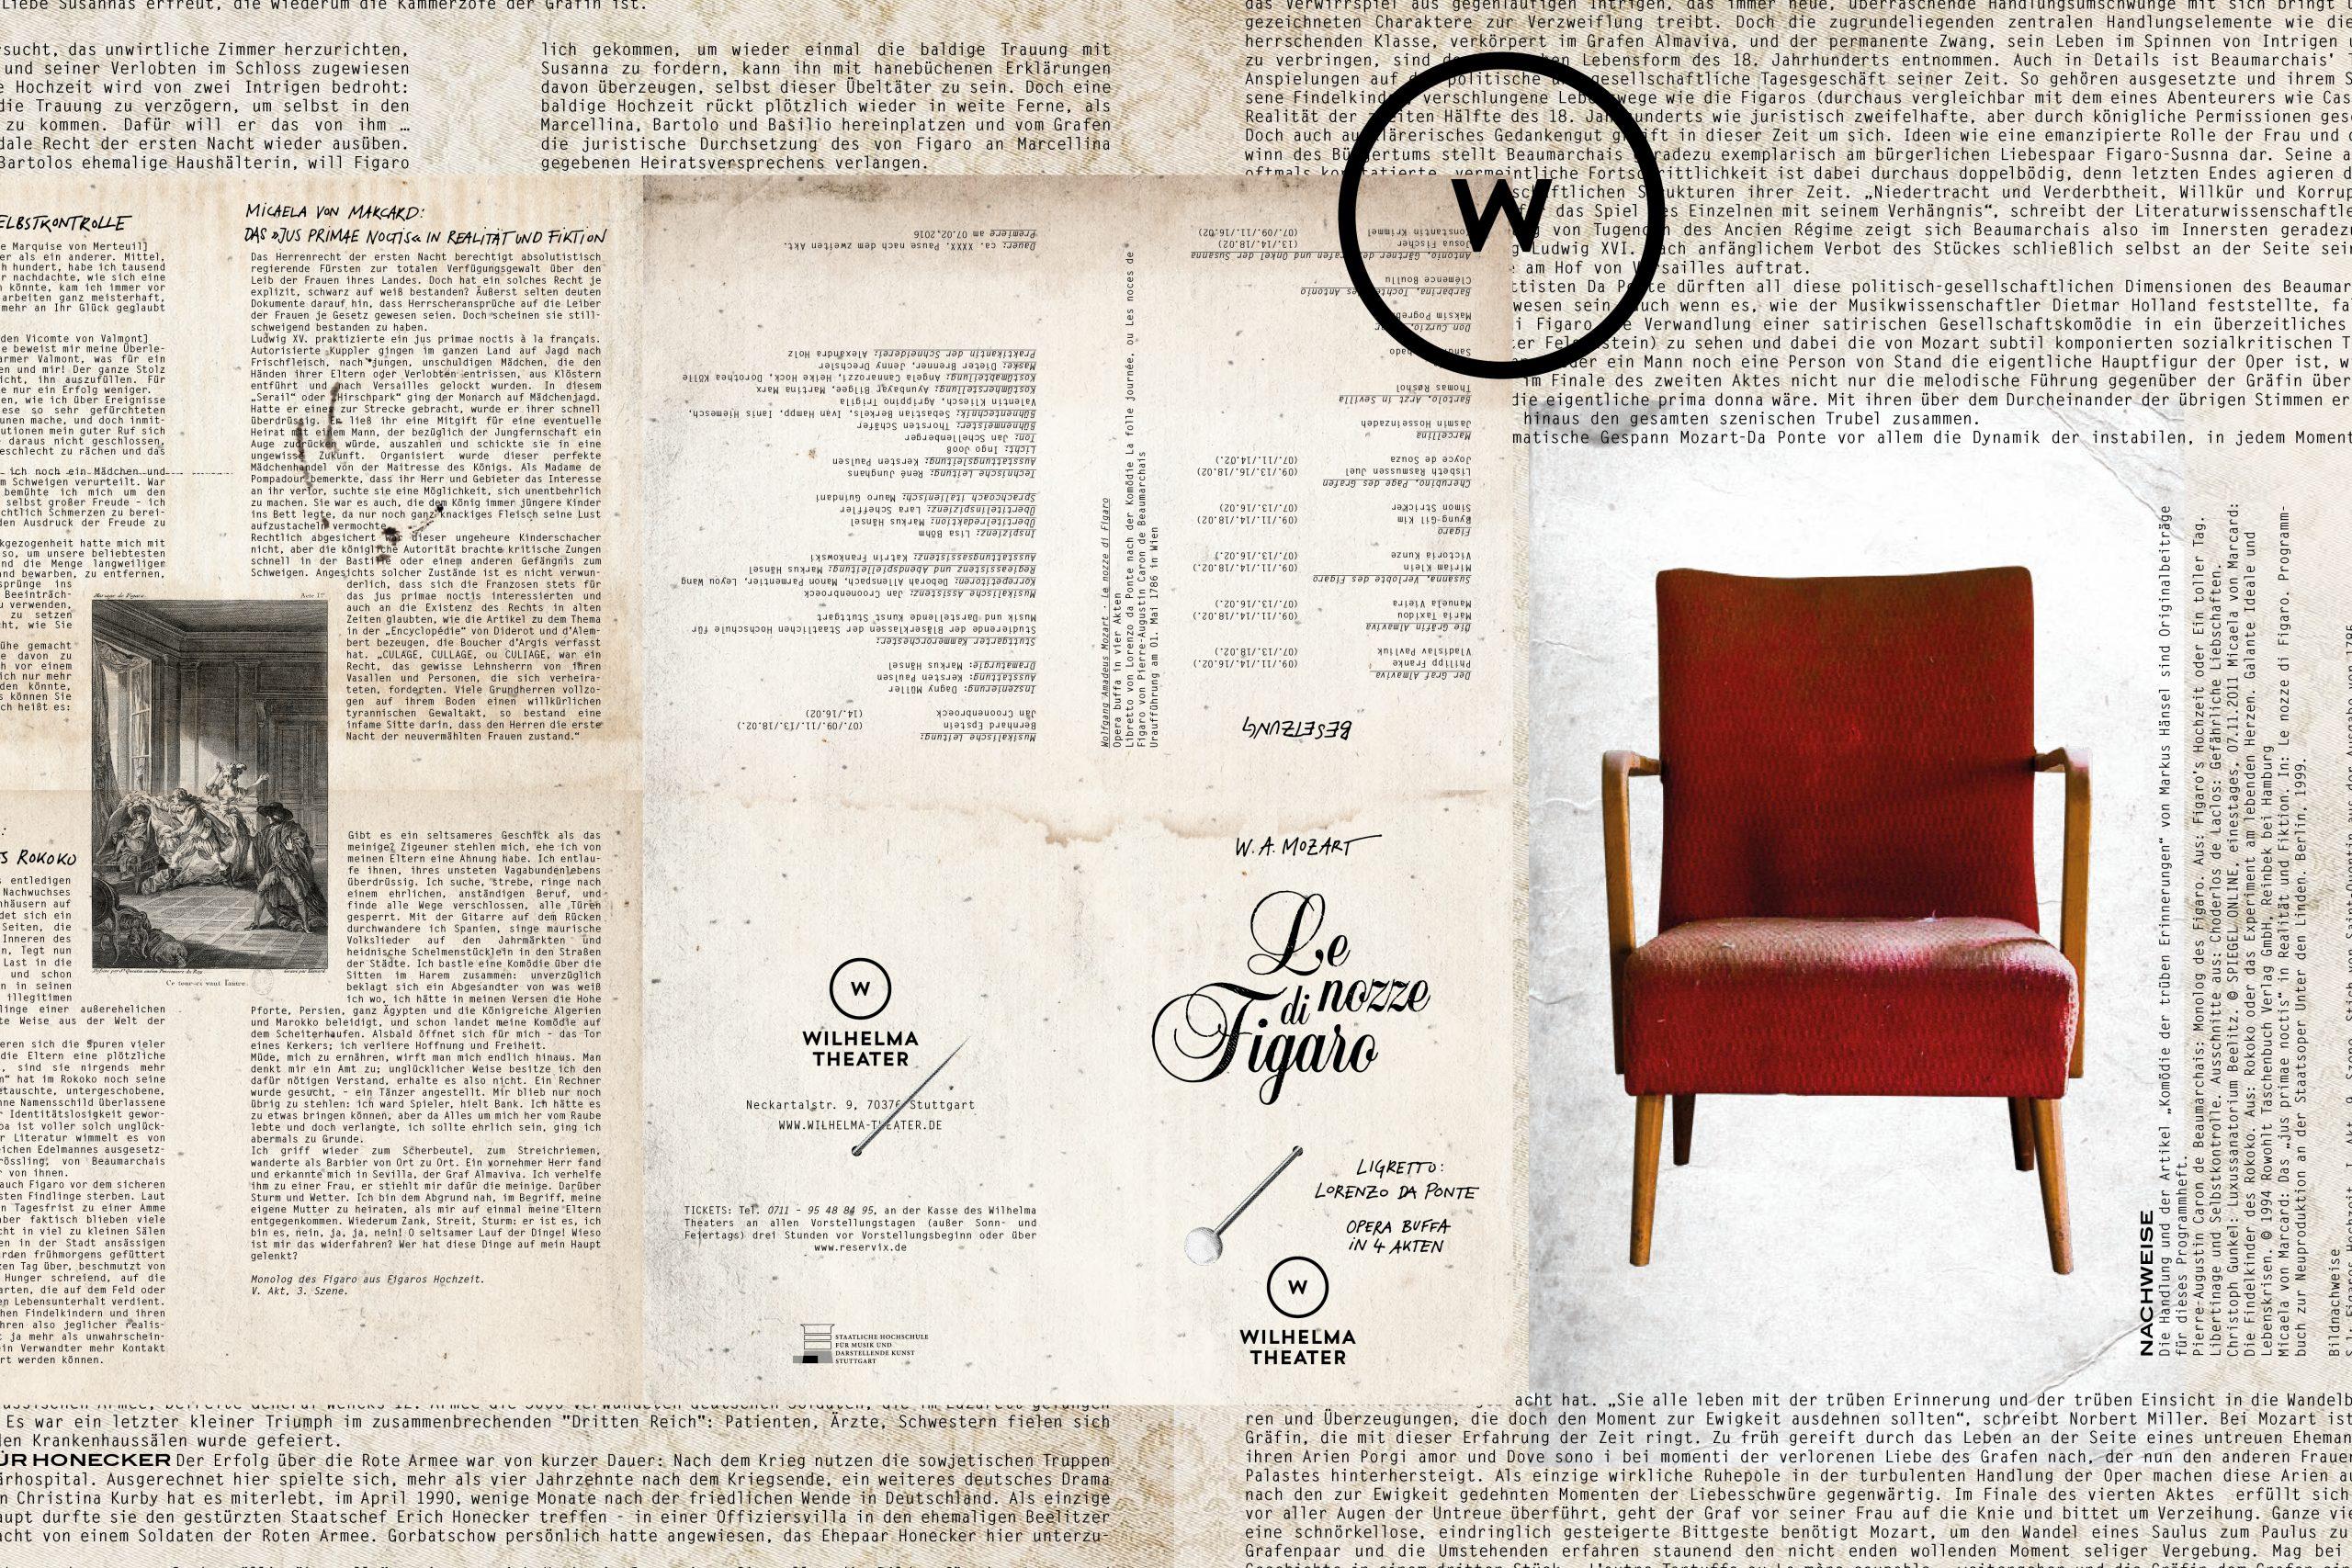 wilhelma_theater_corporate_design_programmheft_Figaro_Mozart_by_majormajor